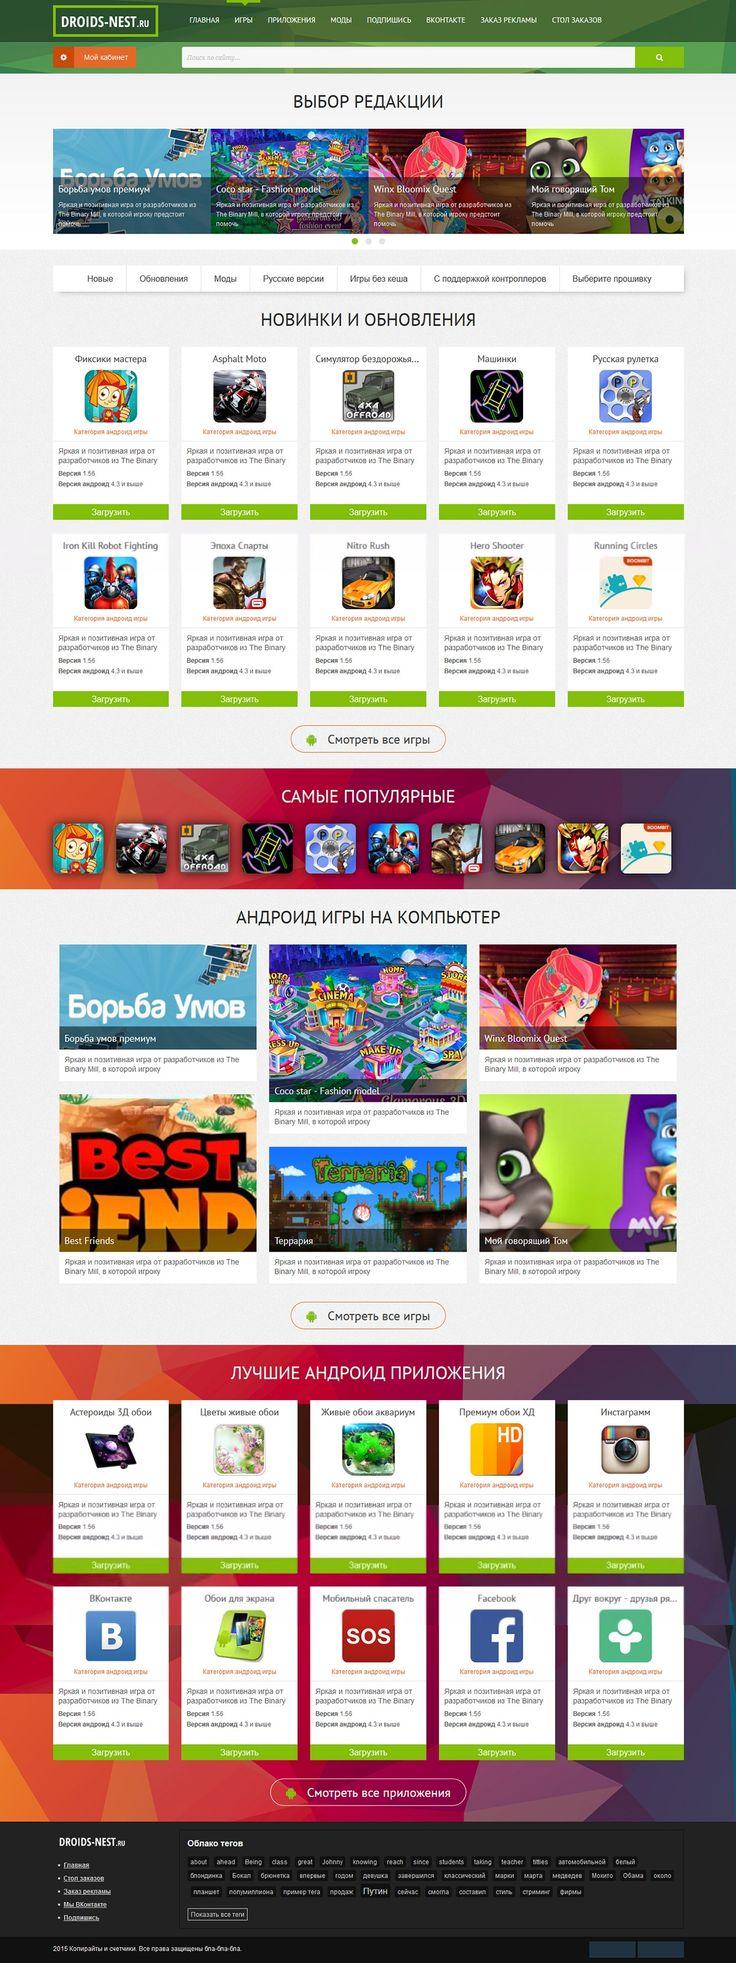 Droids Nest для DLE #templates #website #шаблон #сайт